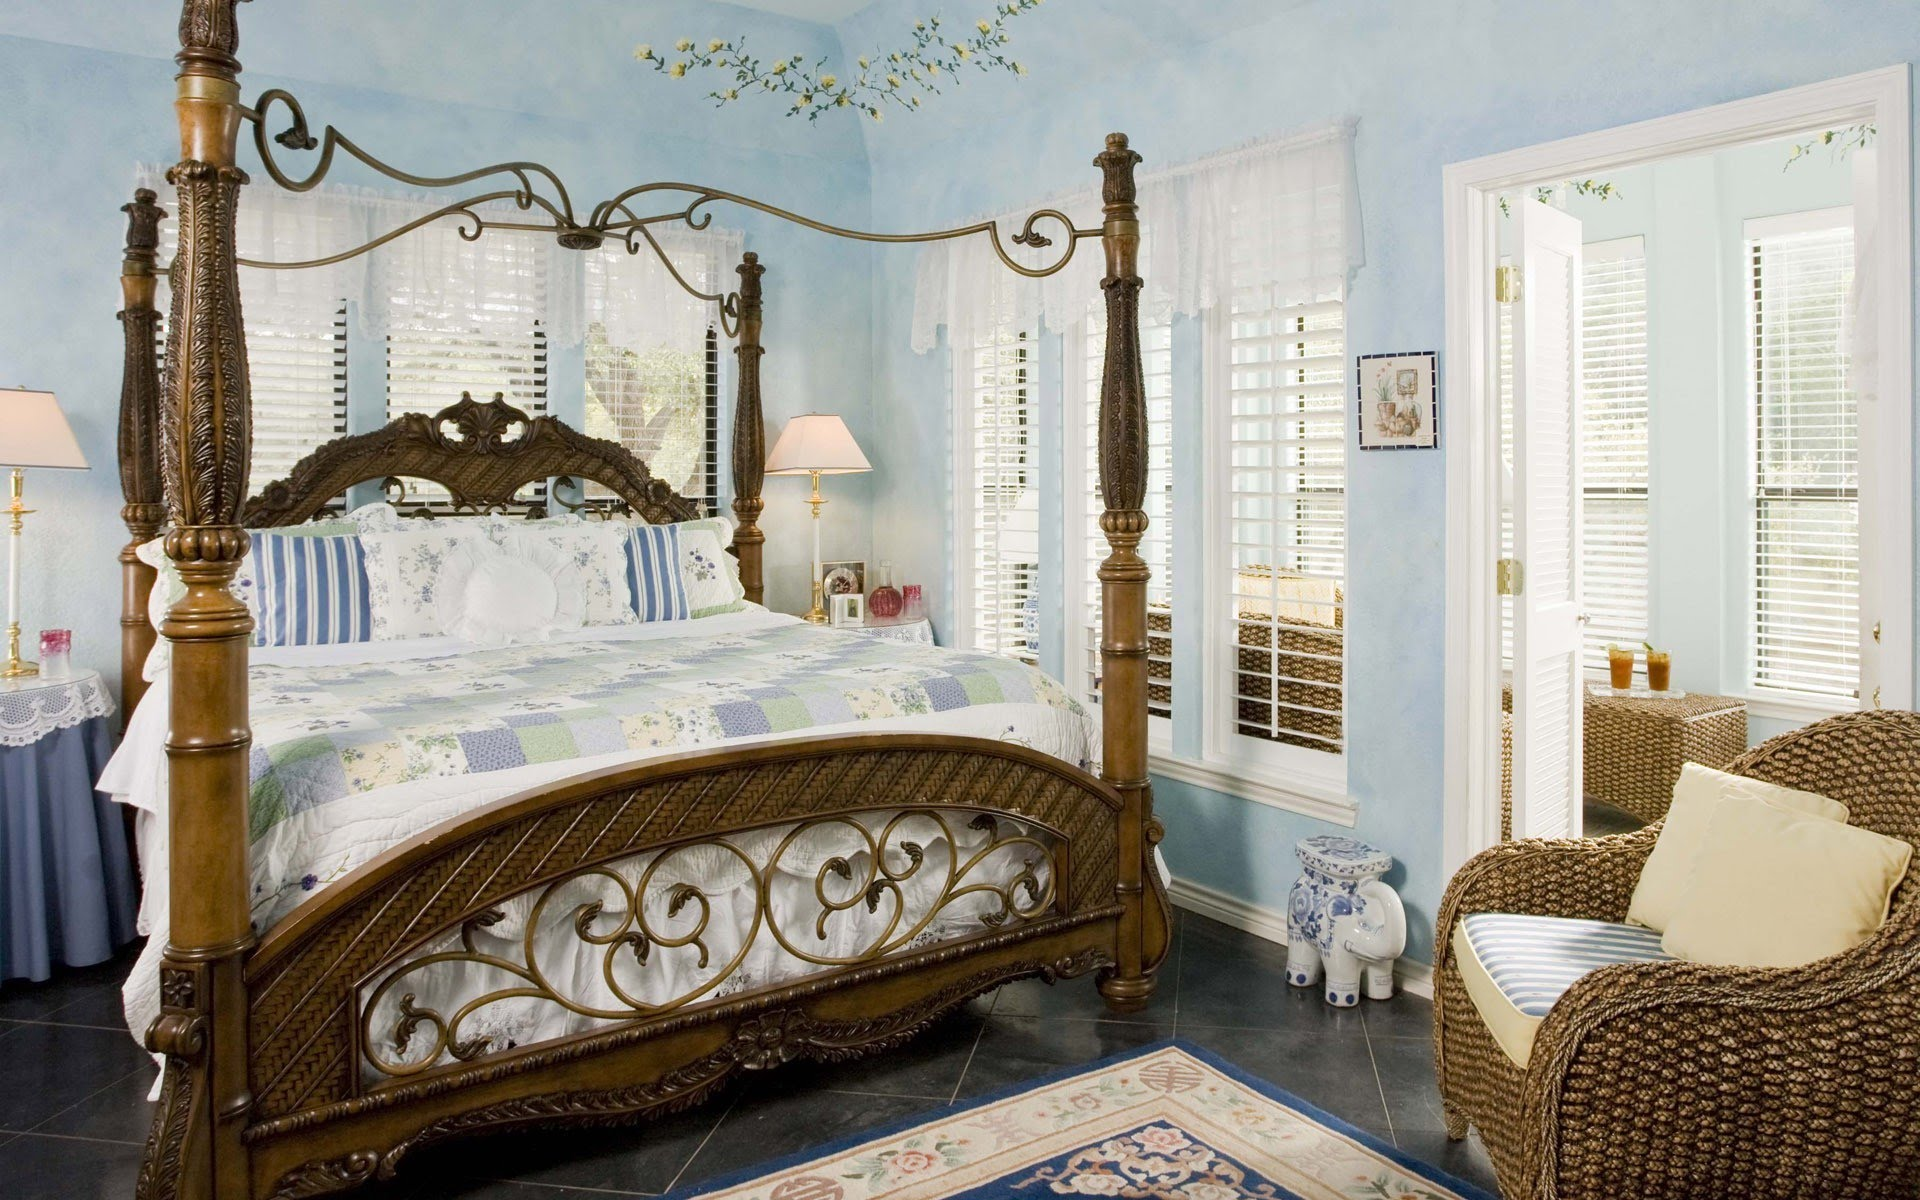 بالصور ورق جدران غرف نوم , صور بعض الديكورات لغرفه النوم 3859 7